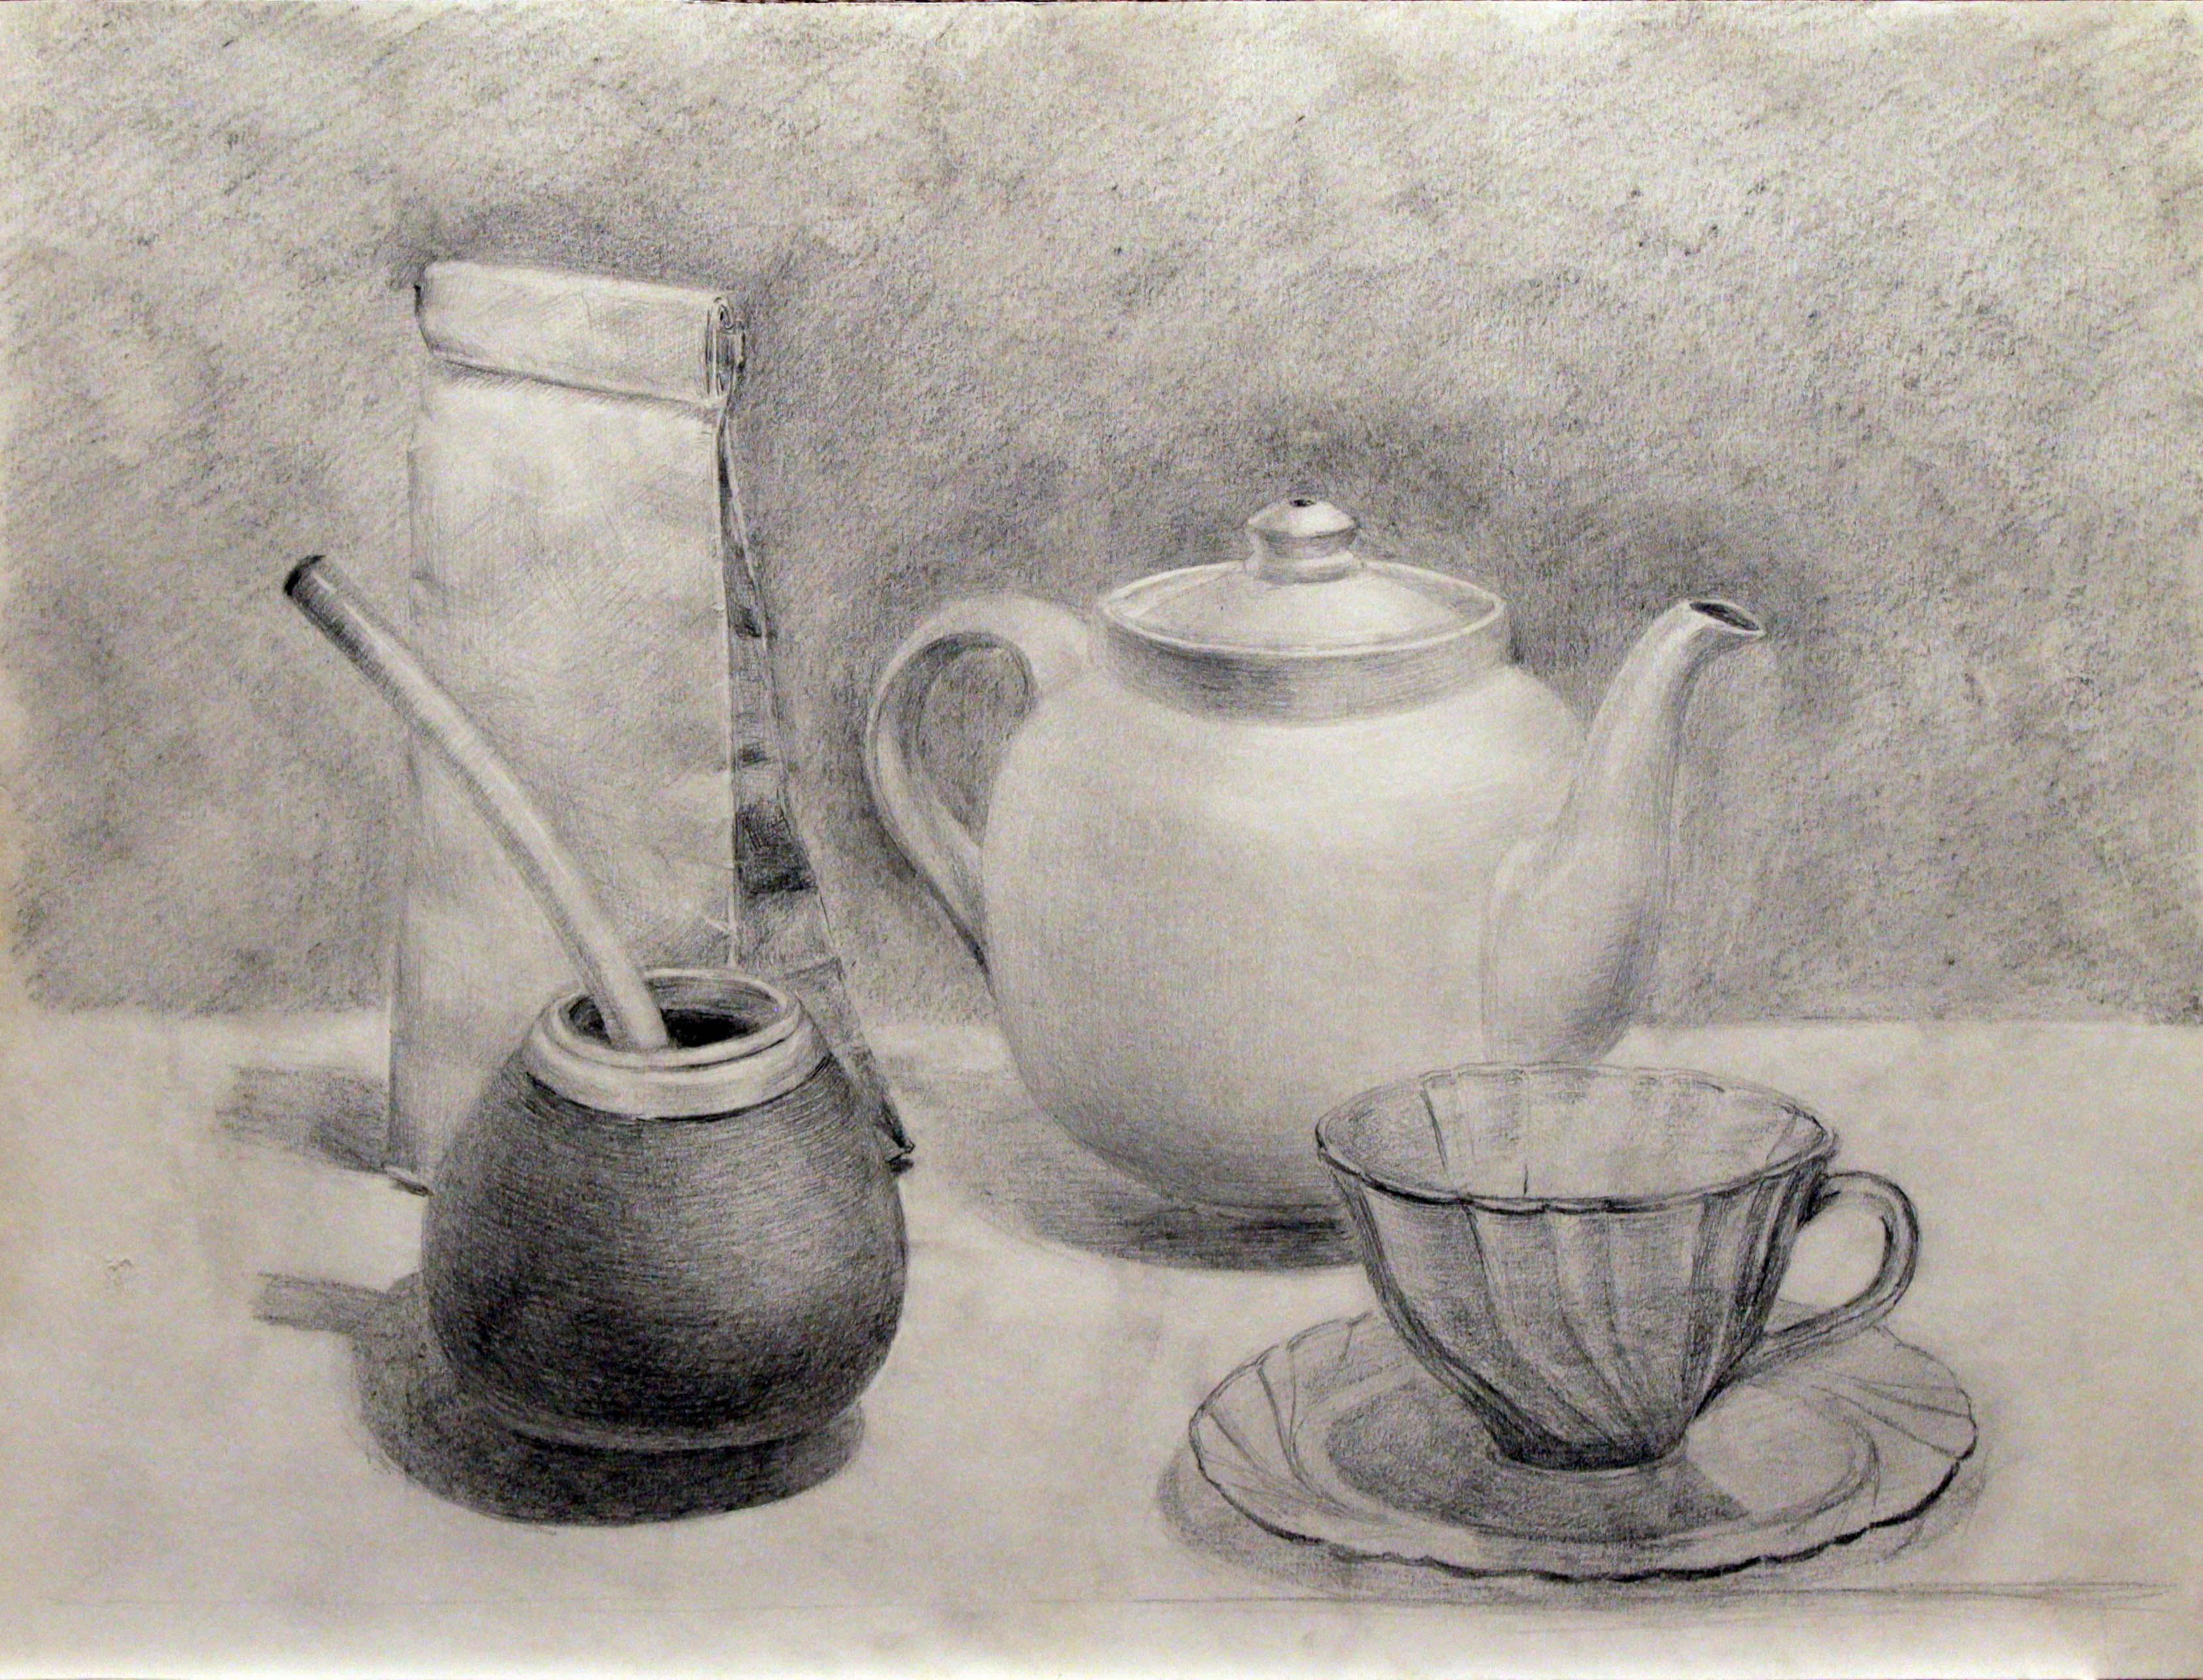 Чайный натюрморт. Бумага, карандаш